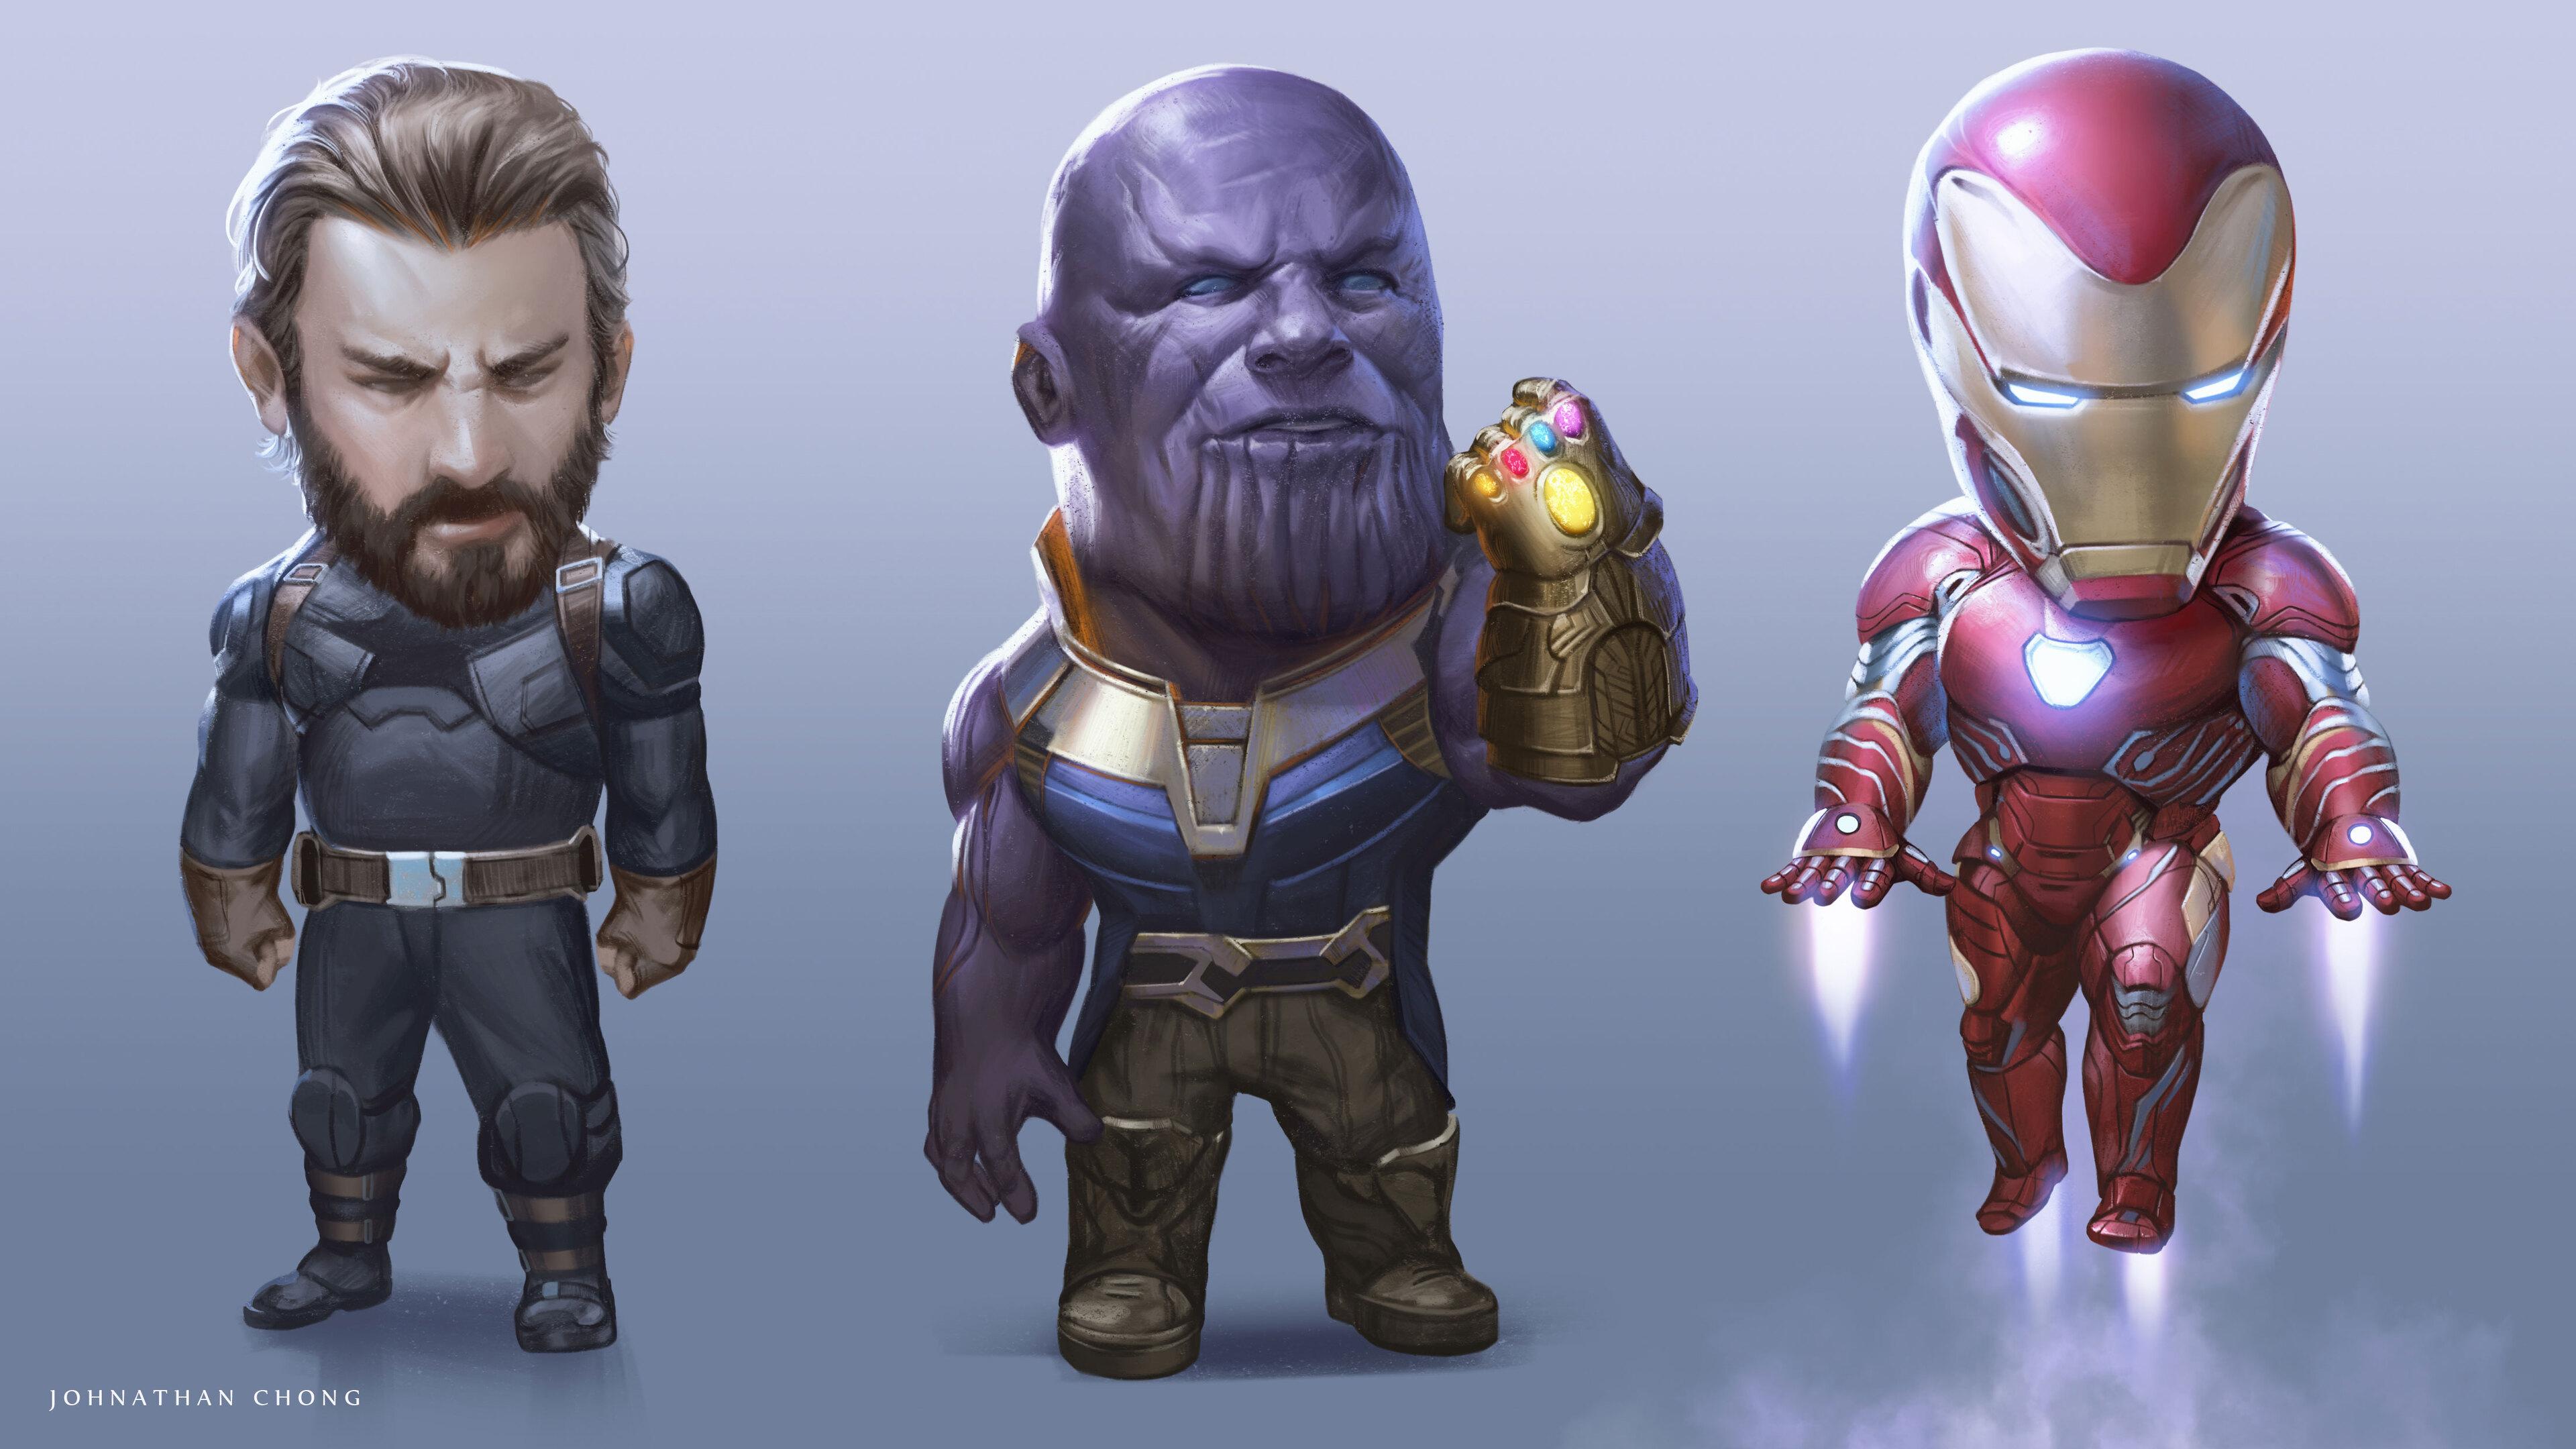 3840x2160 Captain America Thanos Iron Man Avengers Infinity